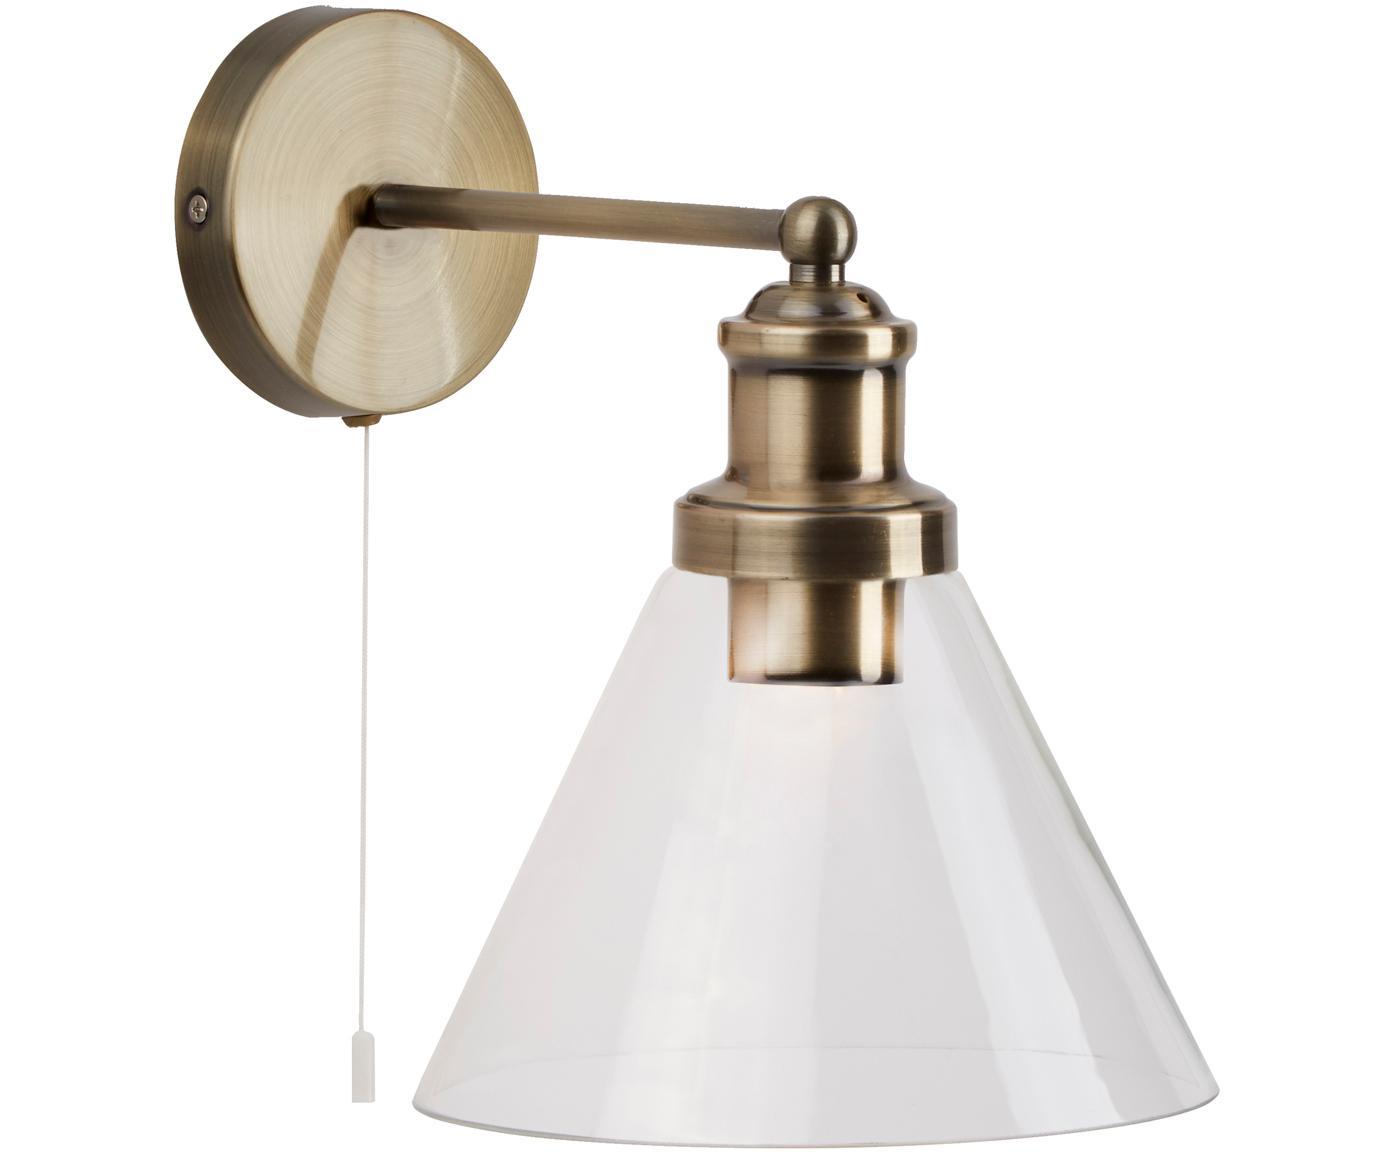 Applique Pyramid, Paralume: vetro, Interruttore: materiale sintetico, Ottone trasparente, Larg. 19 x Alt. 25 cm